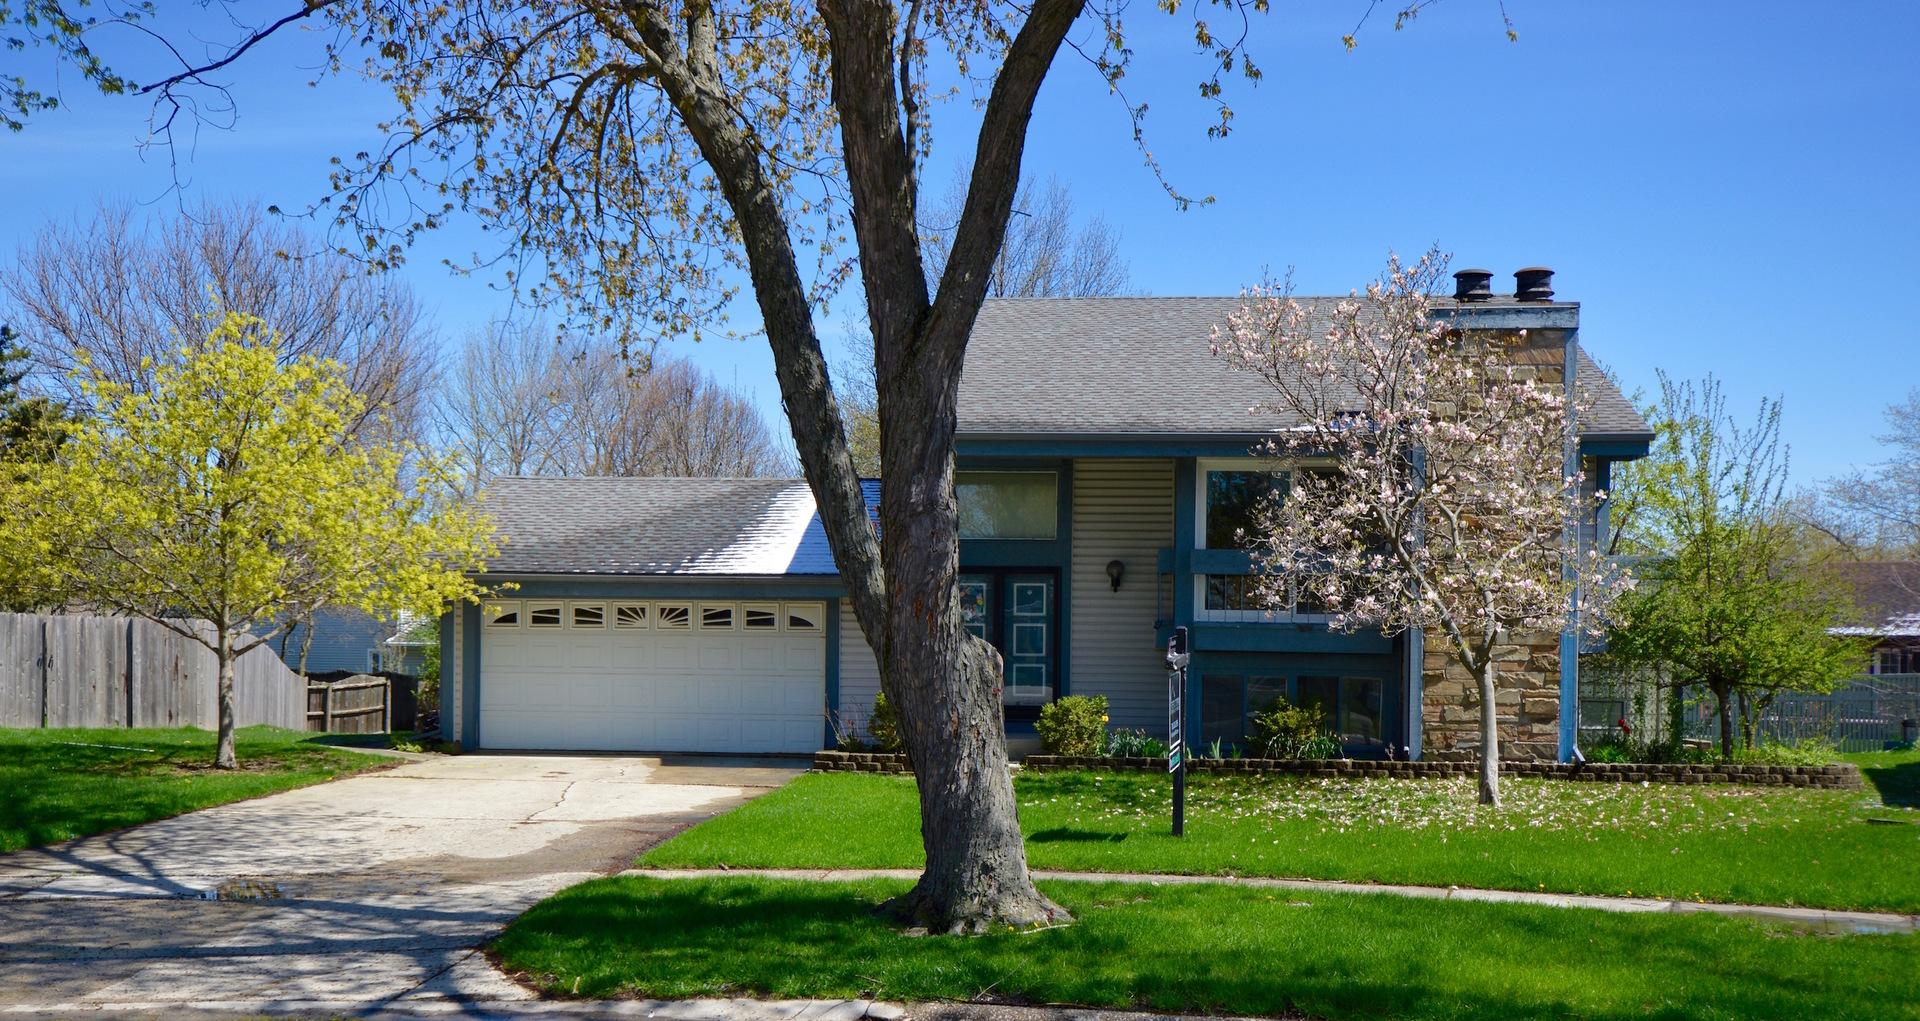 13940 West Timberlane, Homer Glen, Illinois, 60491